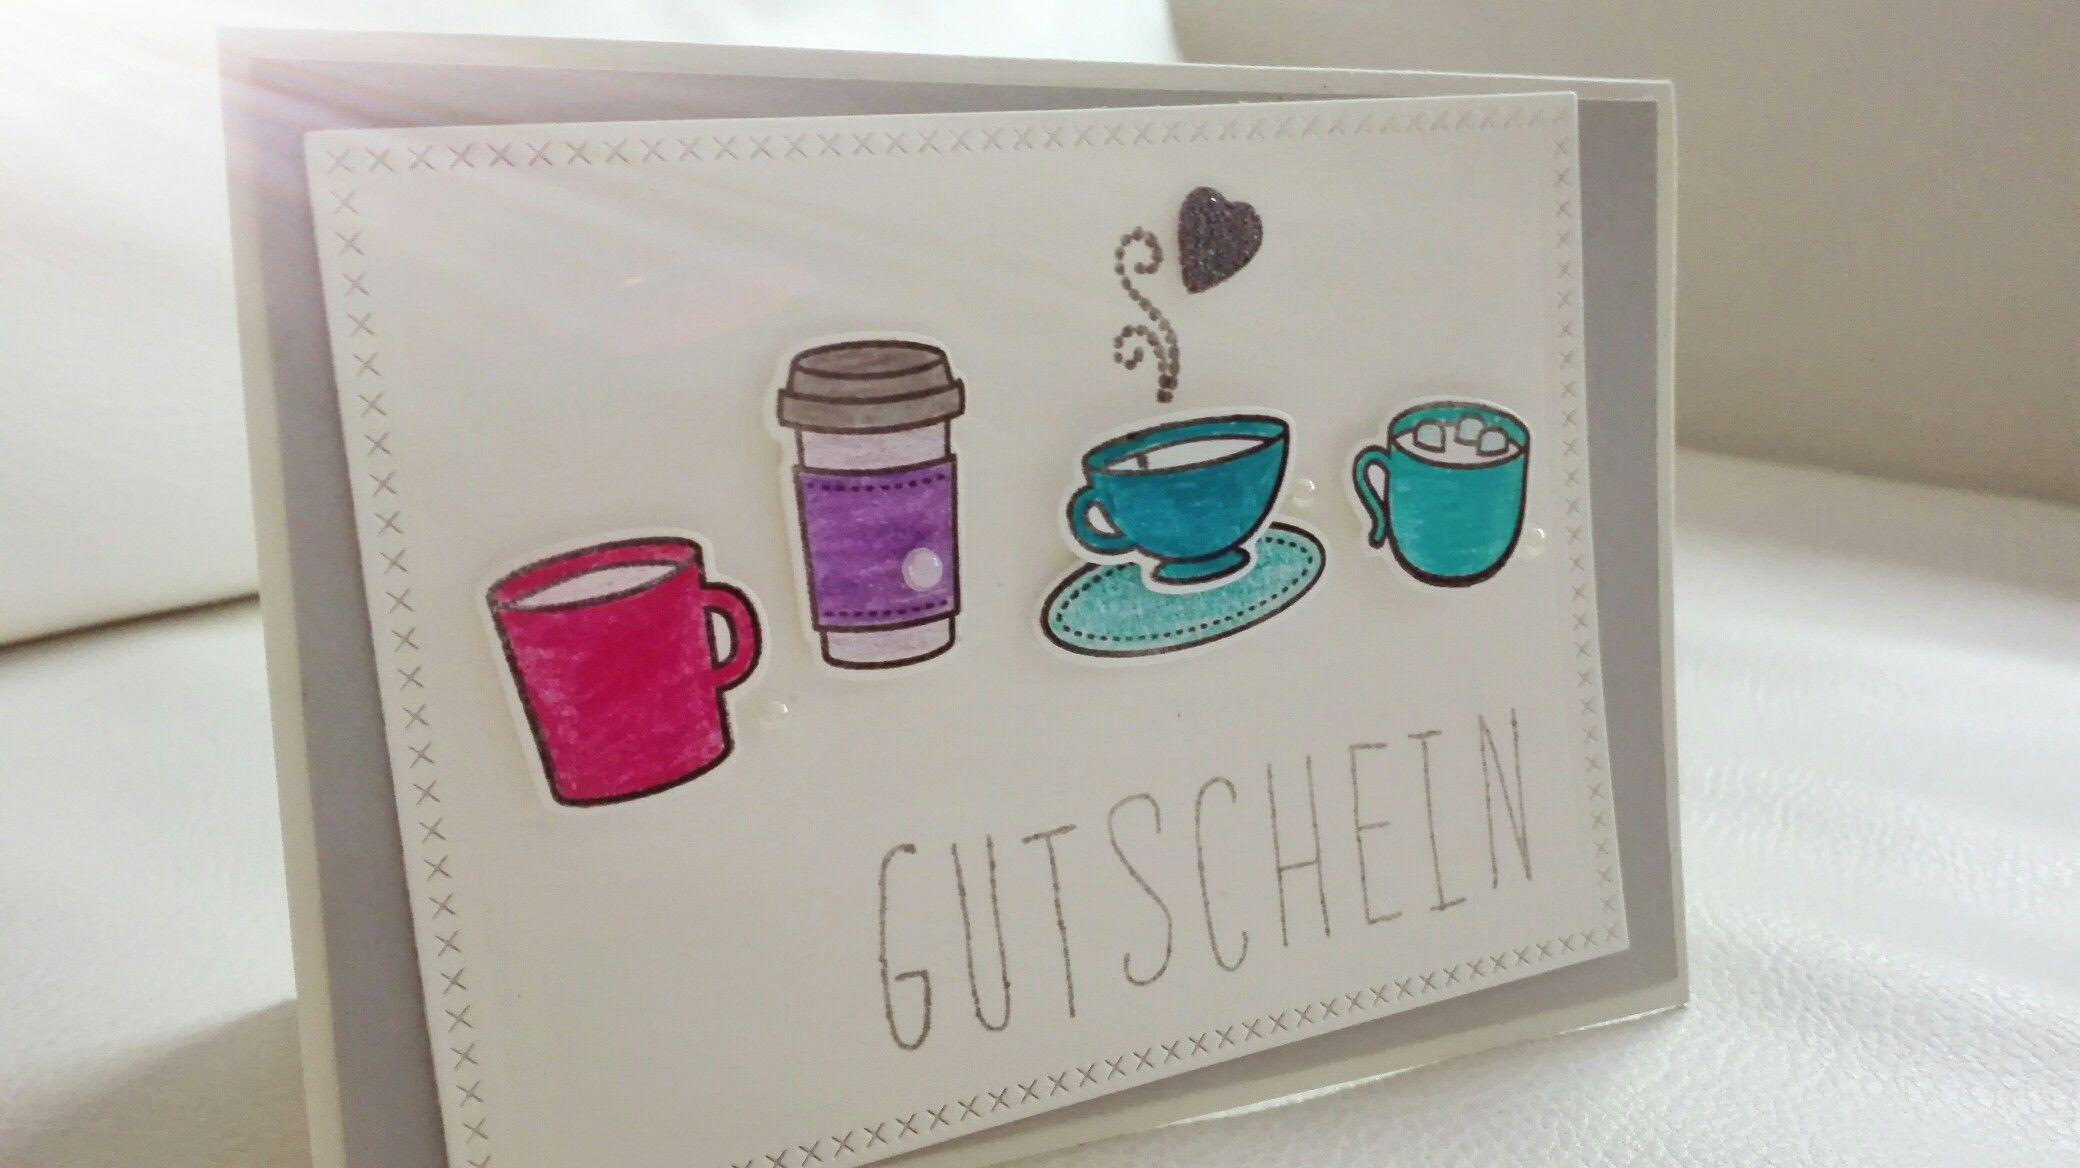 Gutschein / Gift Card using Lawn Fawn Love you a Latte